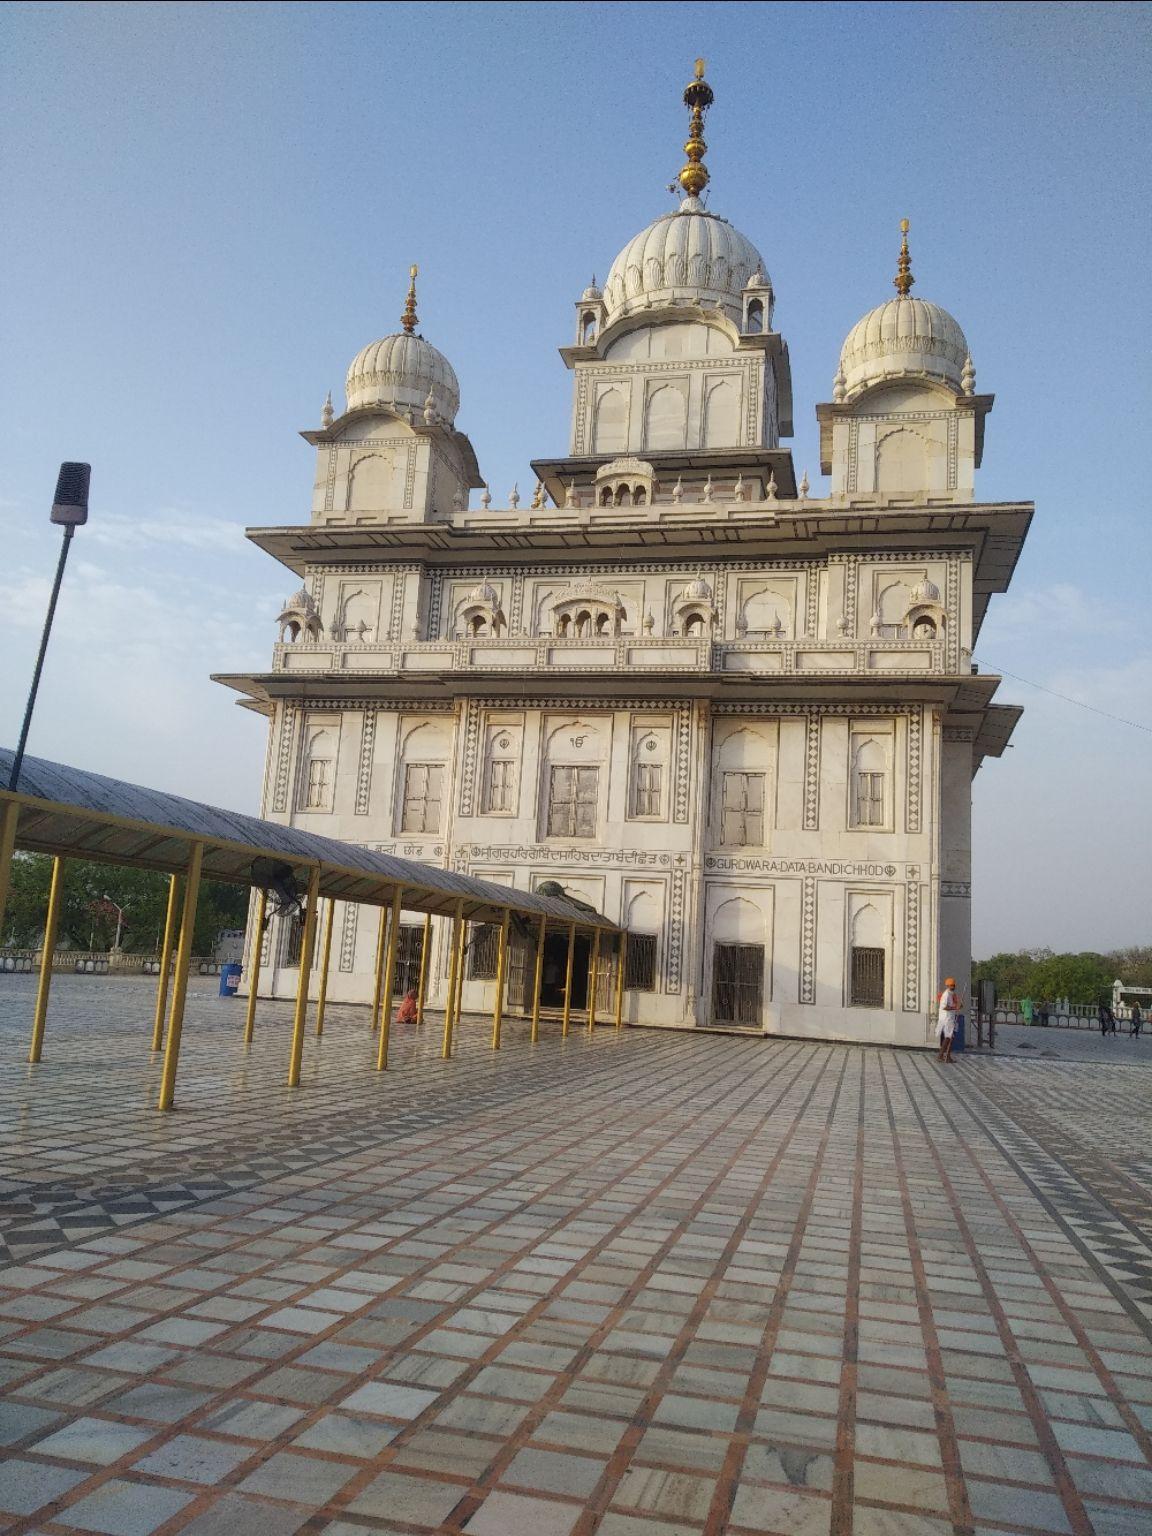 Photo of Gurudwara Shri Data Bandi Chhor Shahib By Ayushi Shrivastava